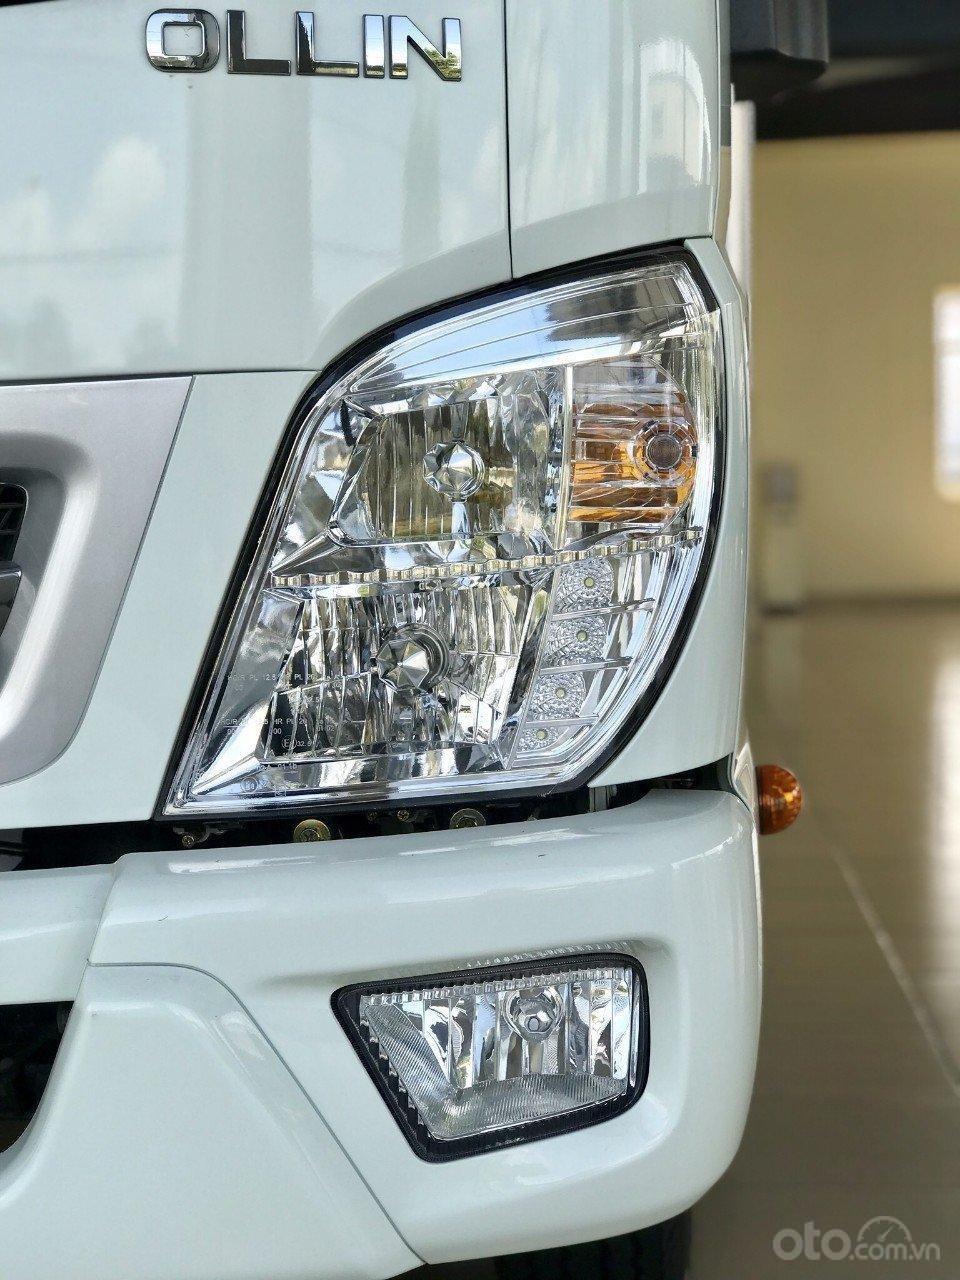 [ Thaco Lái Thiêu] Bán xe tải 3,5 tấn Thaco Ollin350. E4 động cơ Isuzu đời 2018 - Lh: 0944.813.912 (5)